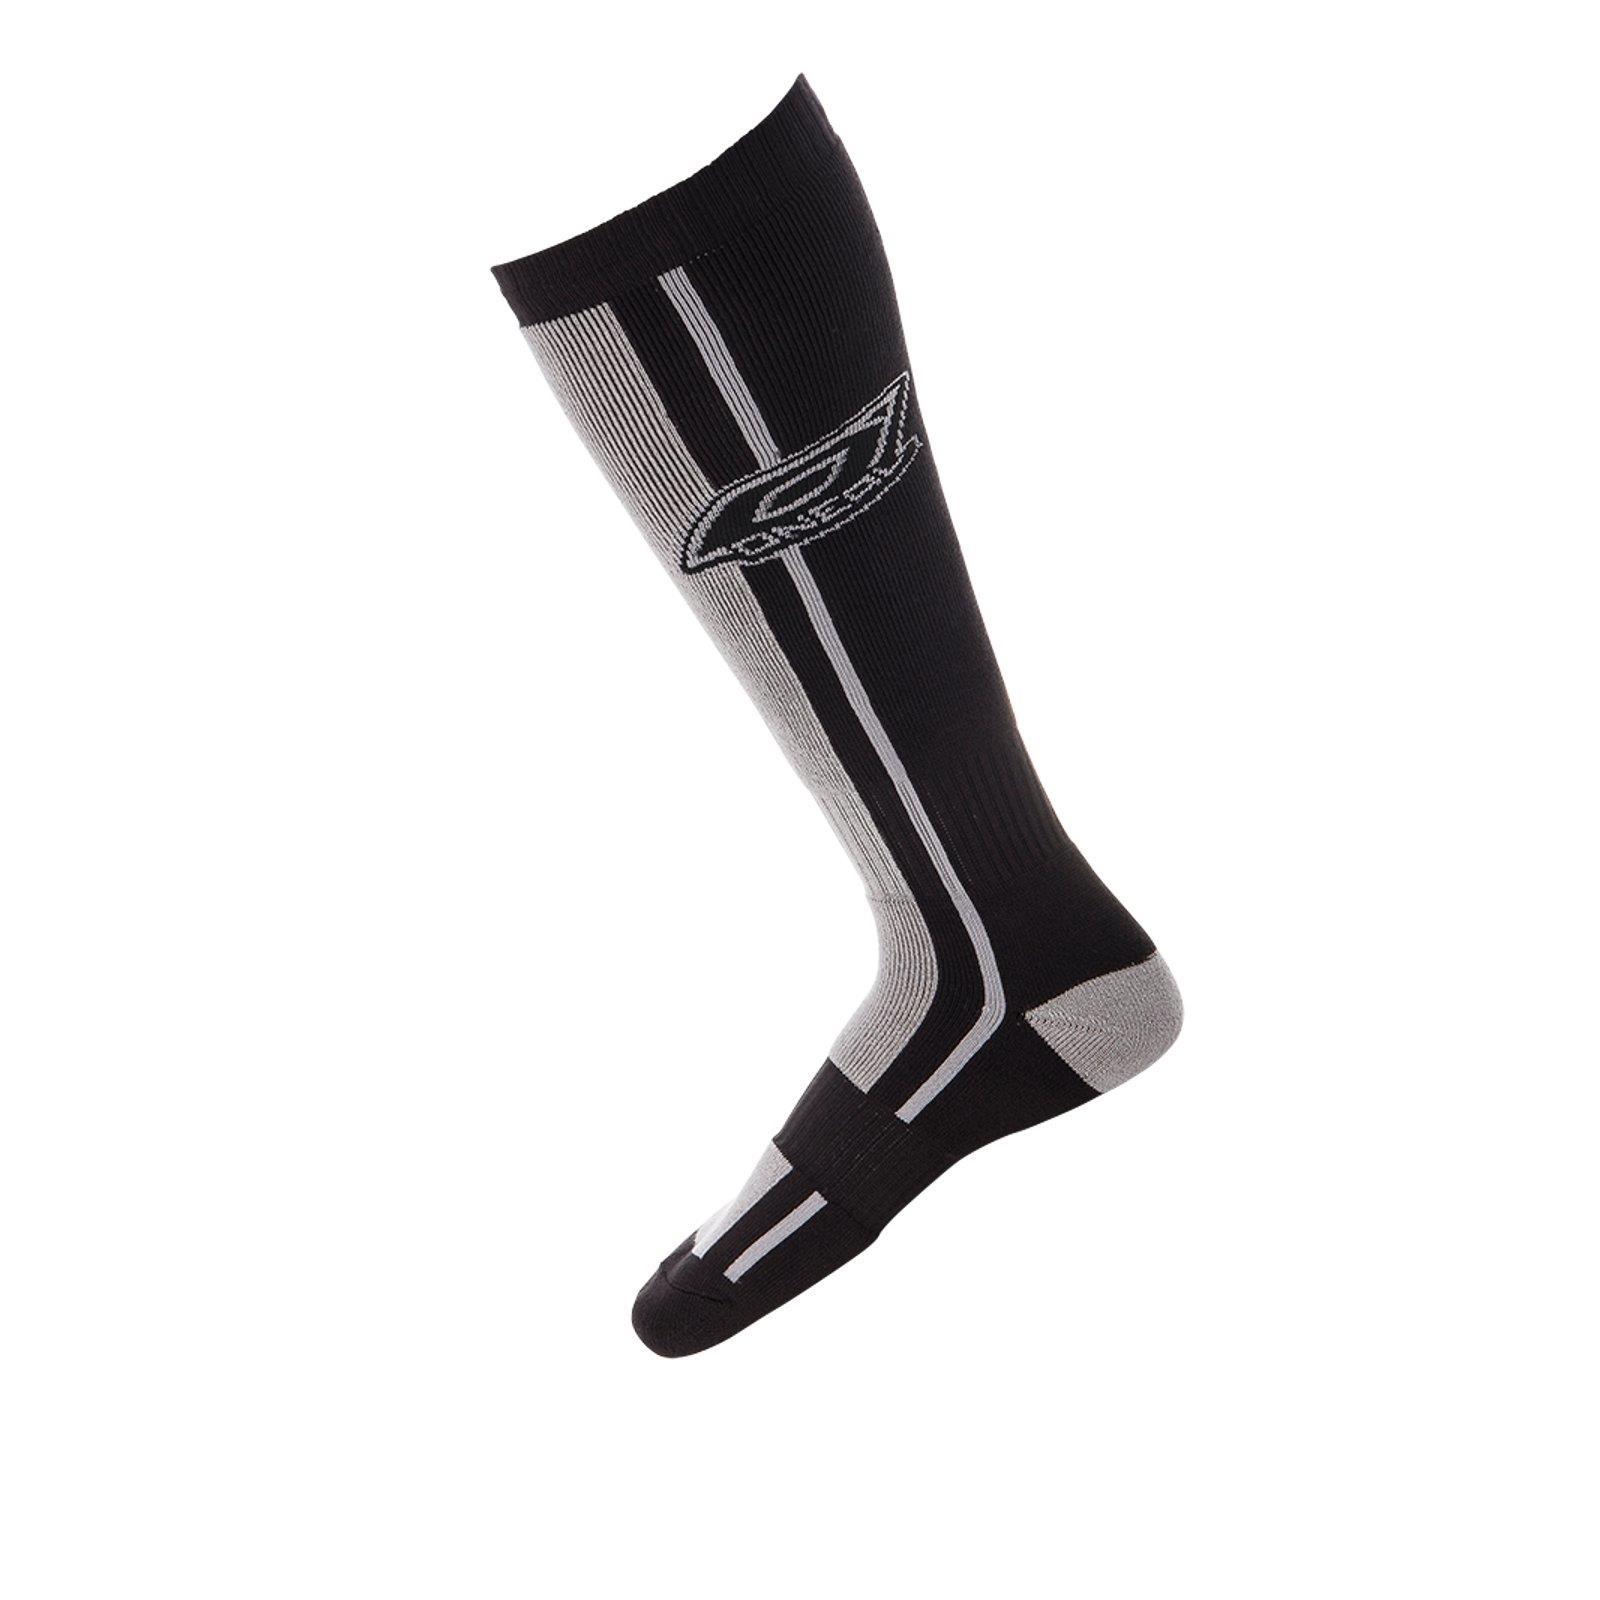 ONEAL-MOTO-CROSS-Calze-Moto-Enduro-MX-MTB-ATV-Quad-Calze-Sock-BICICLETTA-FR miniatura 32